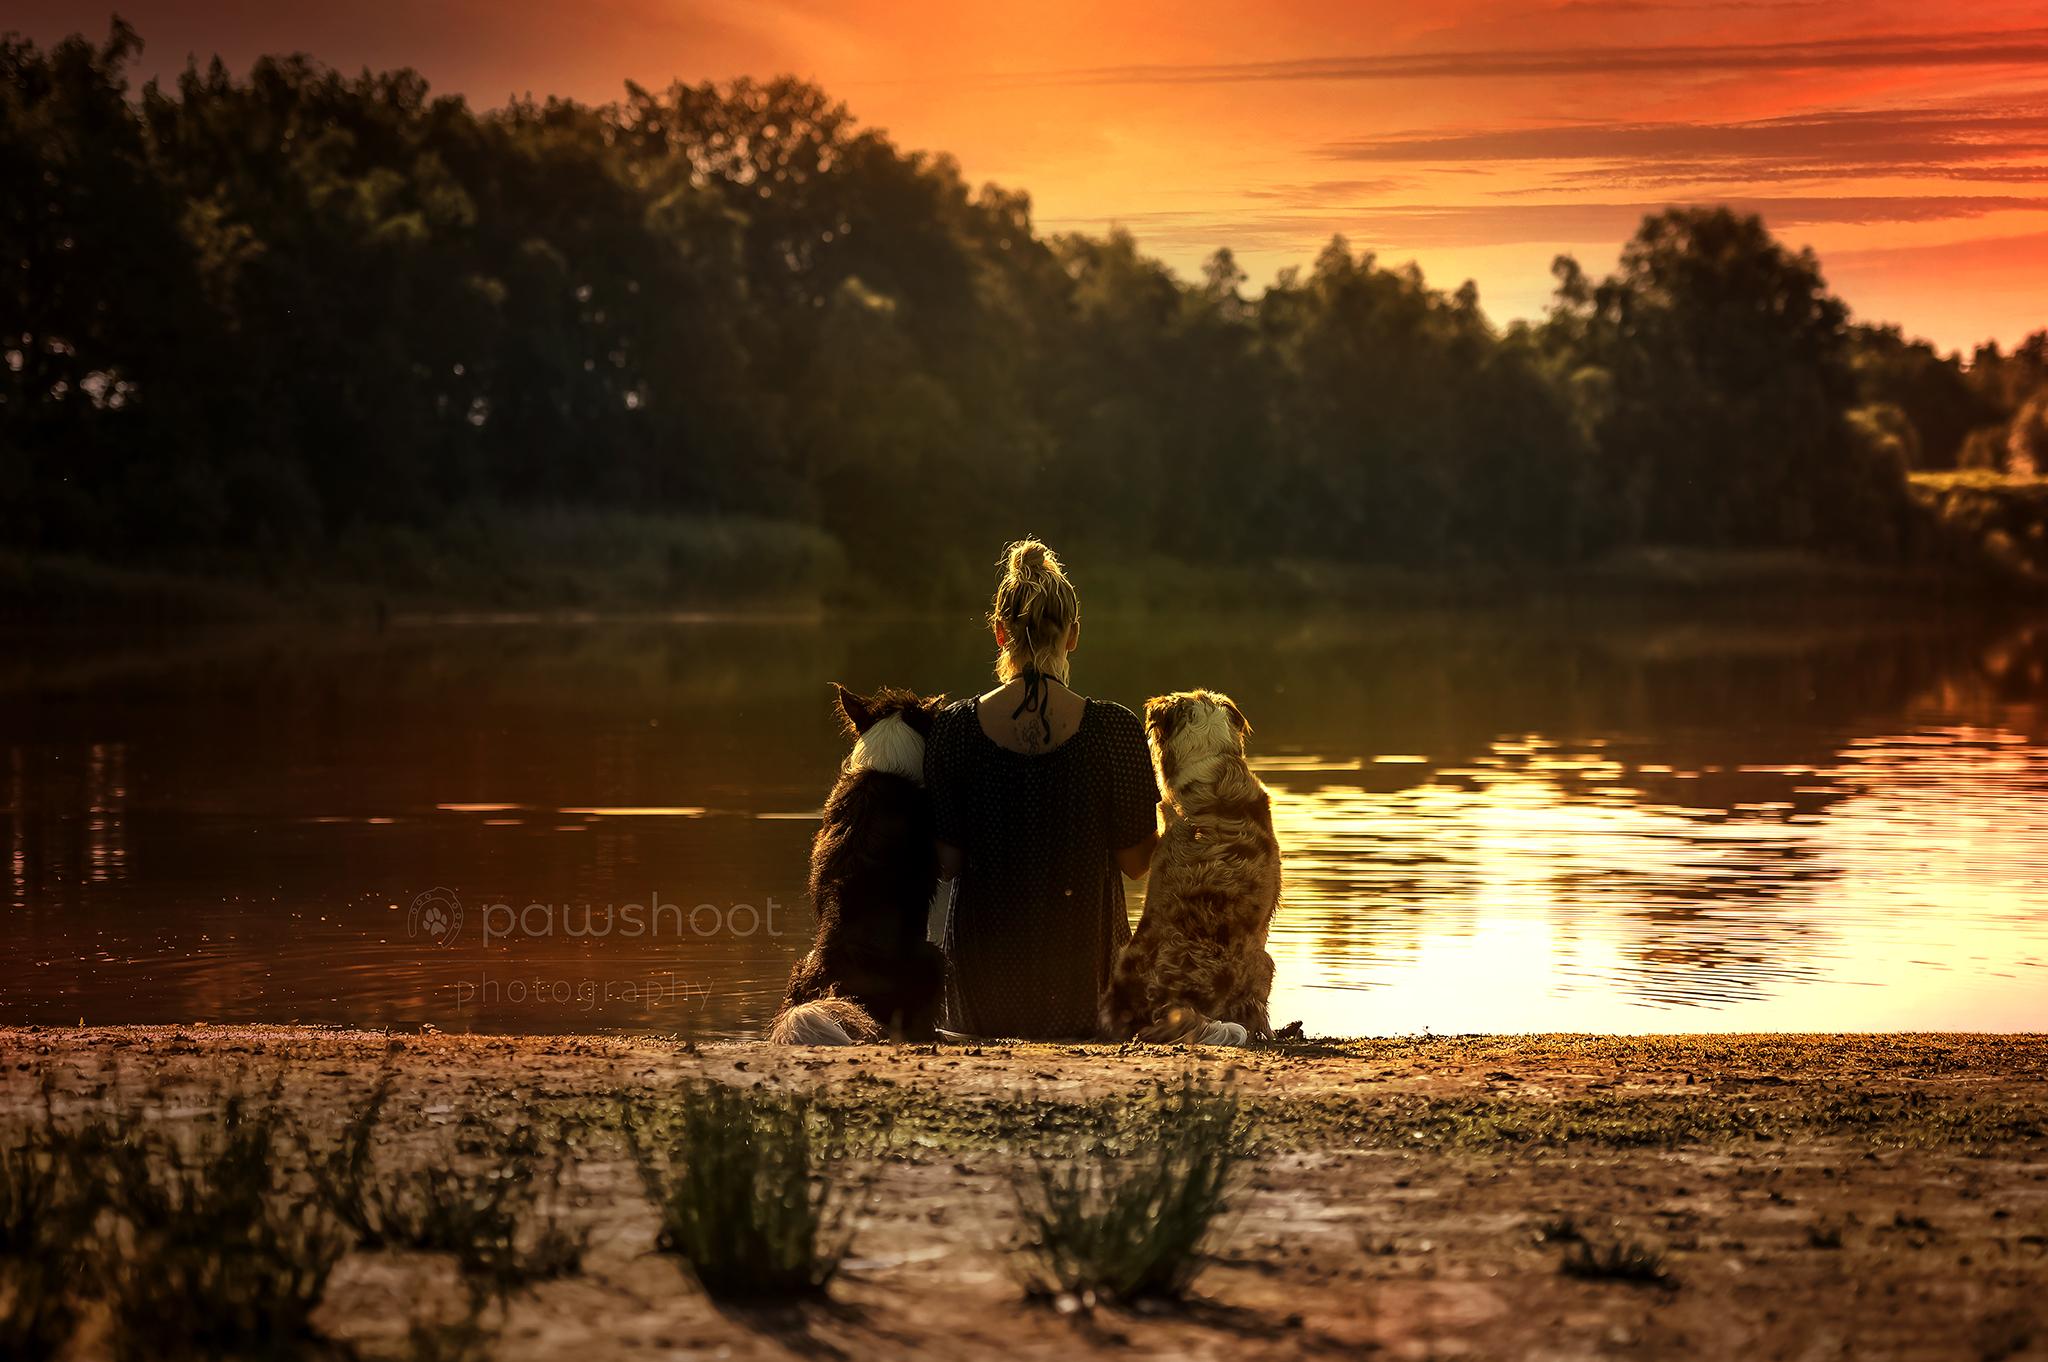 hondenportret zonsondergang Pawshoot hondenfotografie